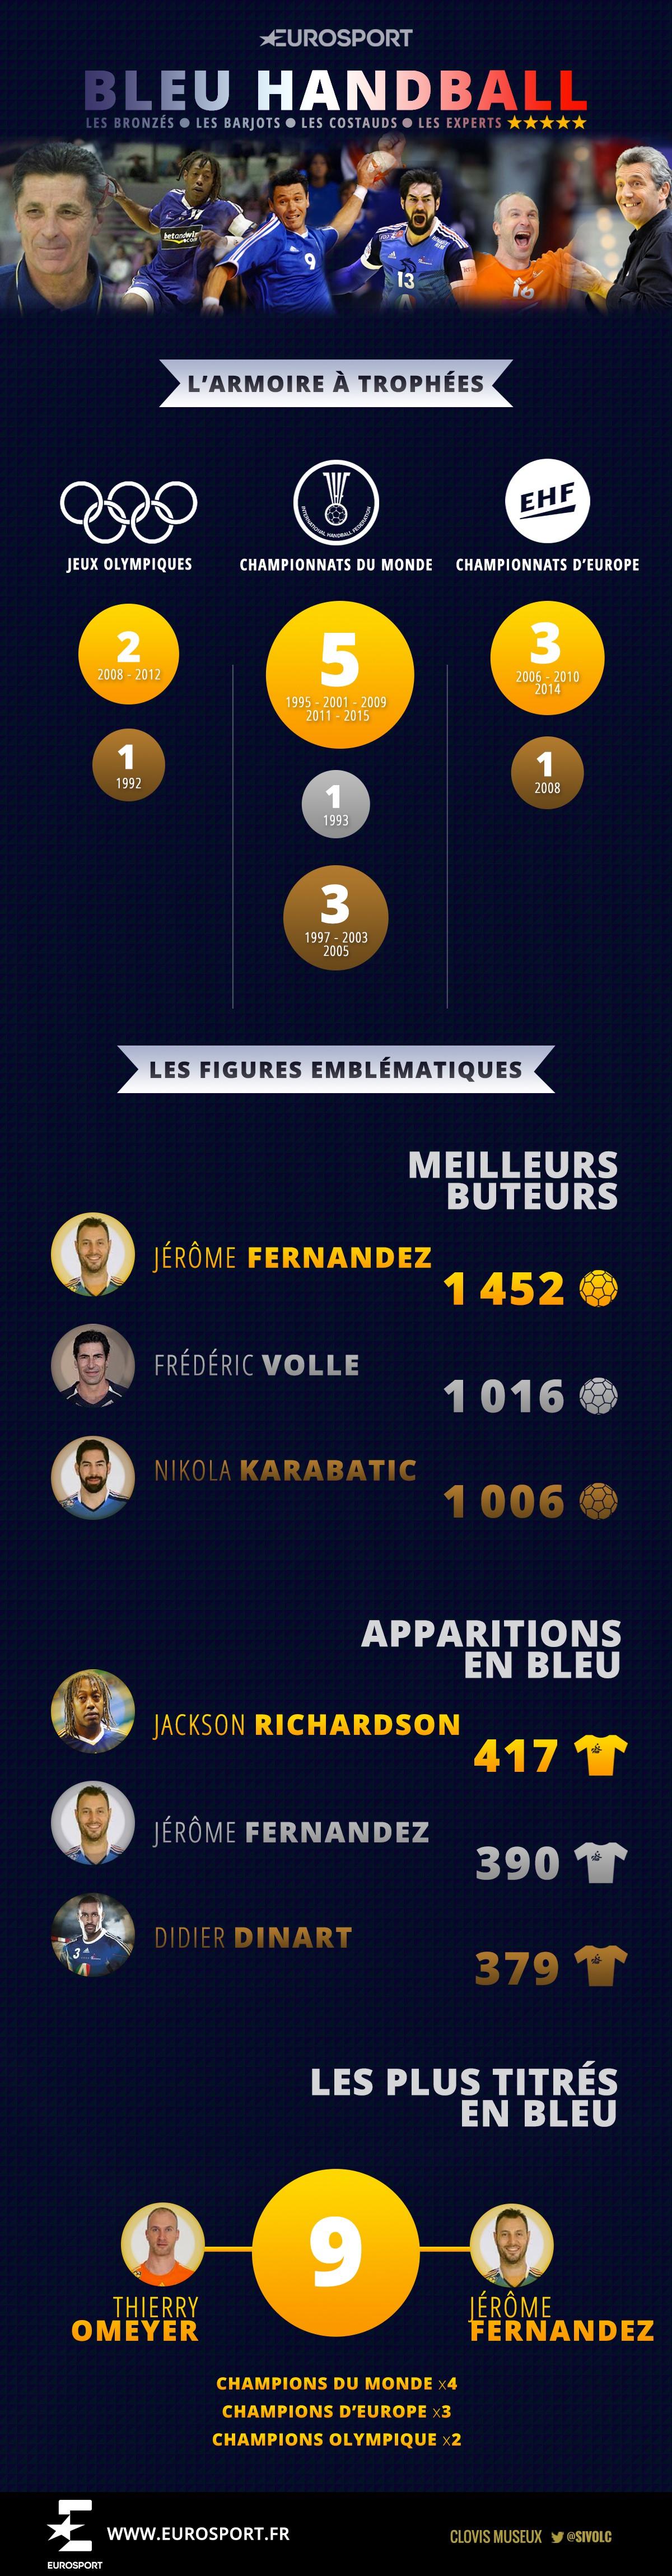 L'équipe de France de handball, un quart de siècle au sommet